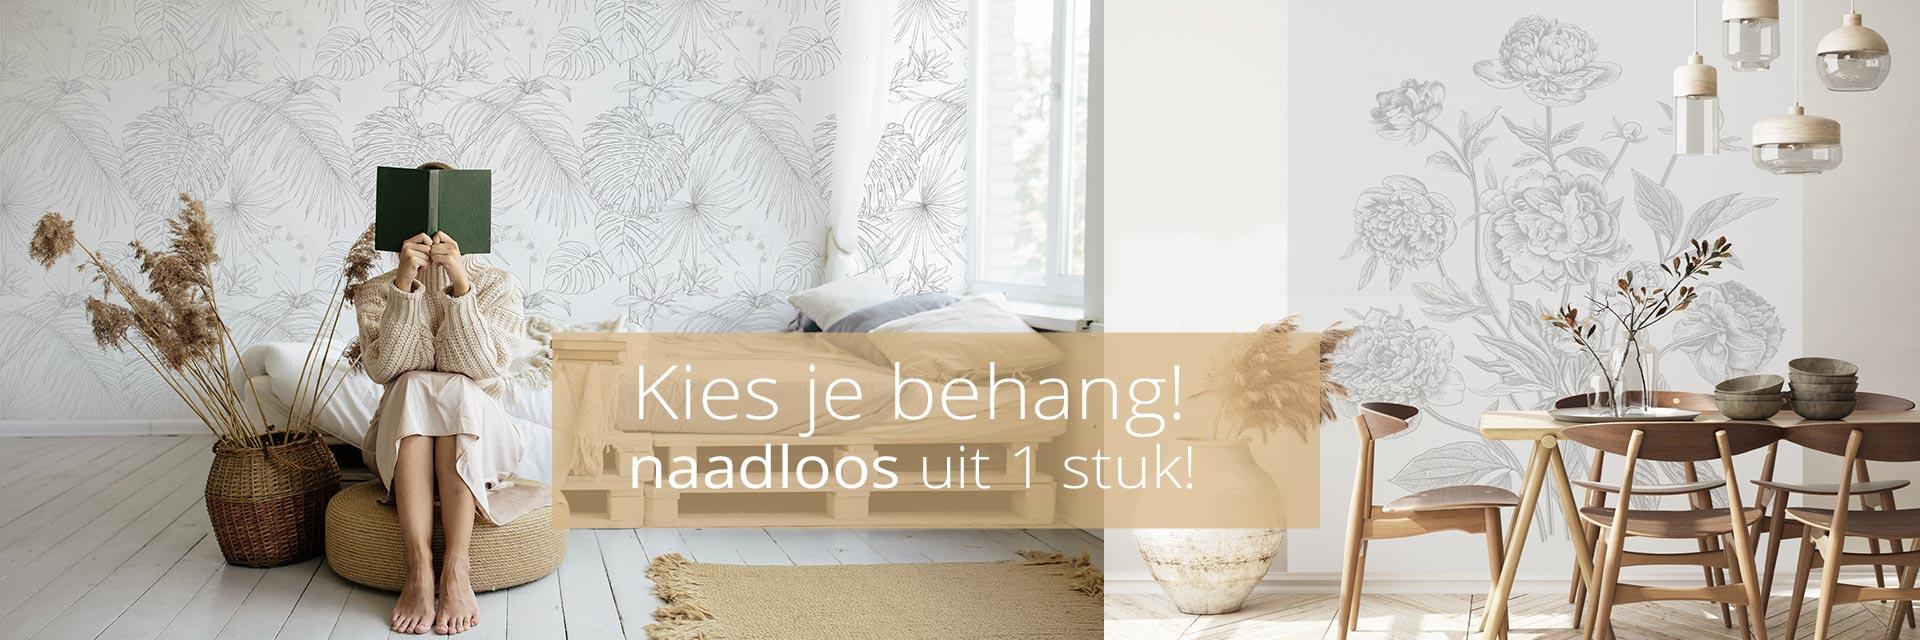 WANDenWOONdeco.nl Kies je behang